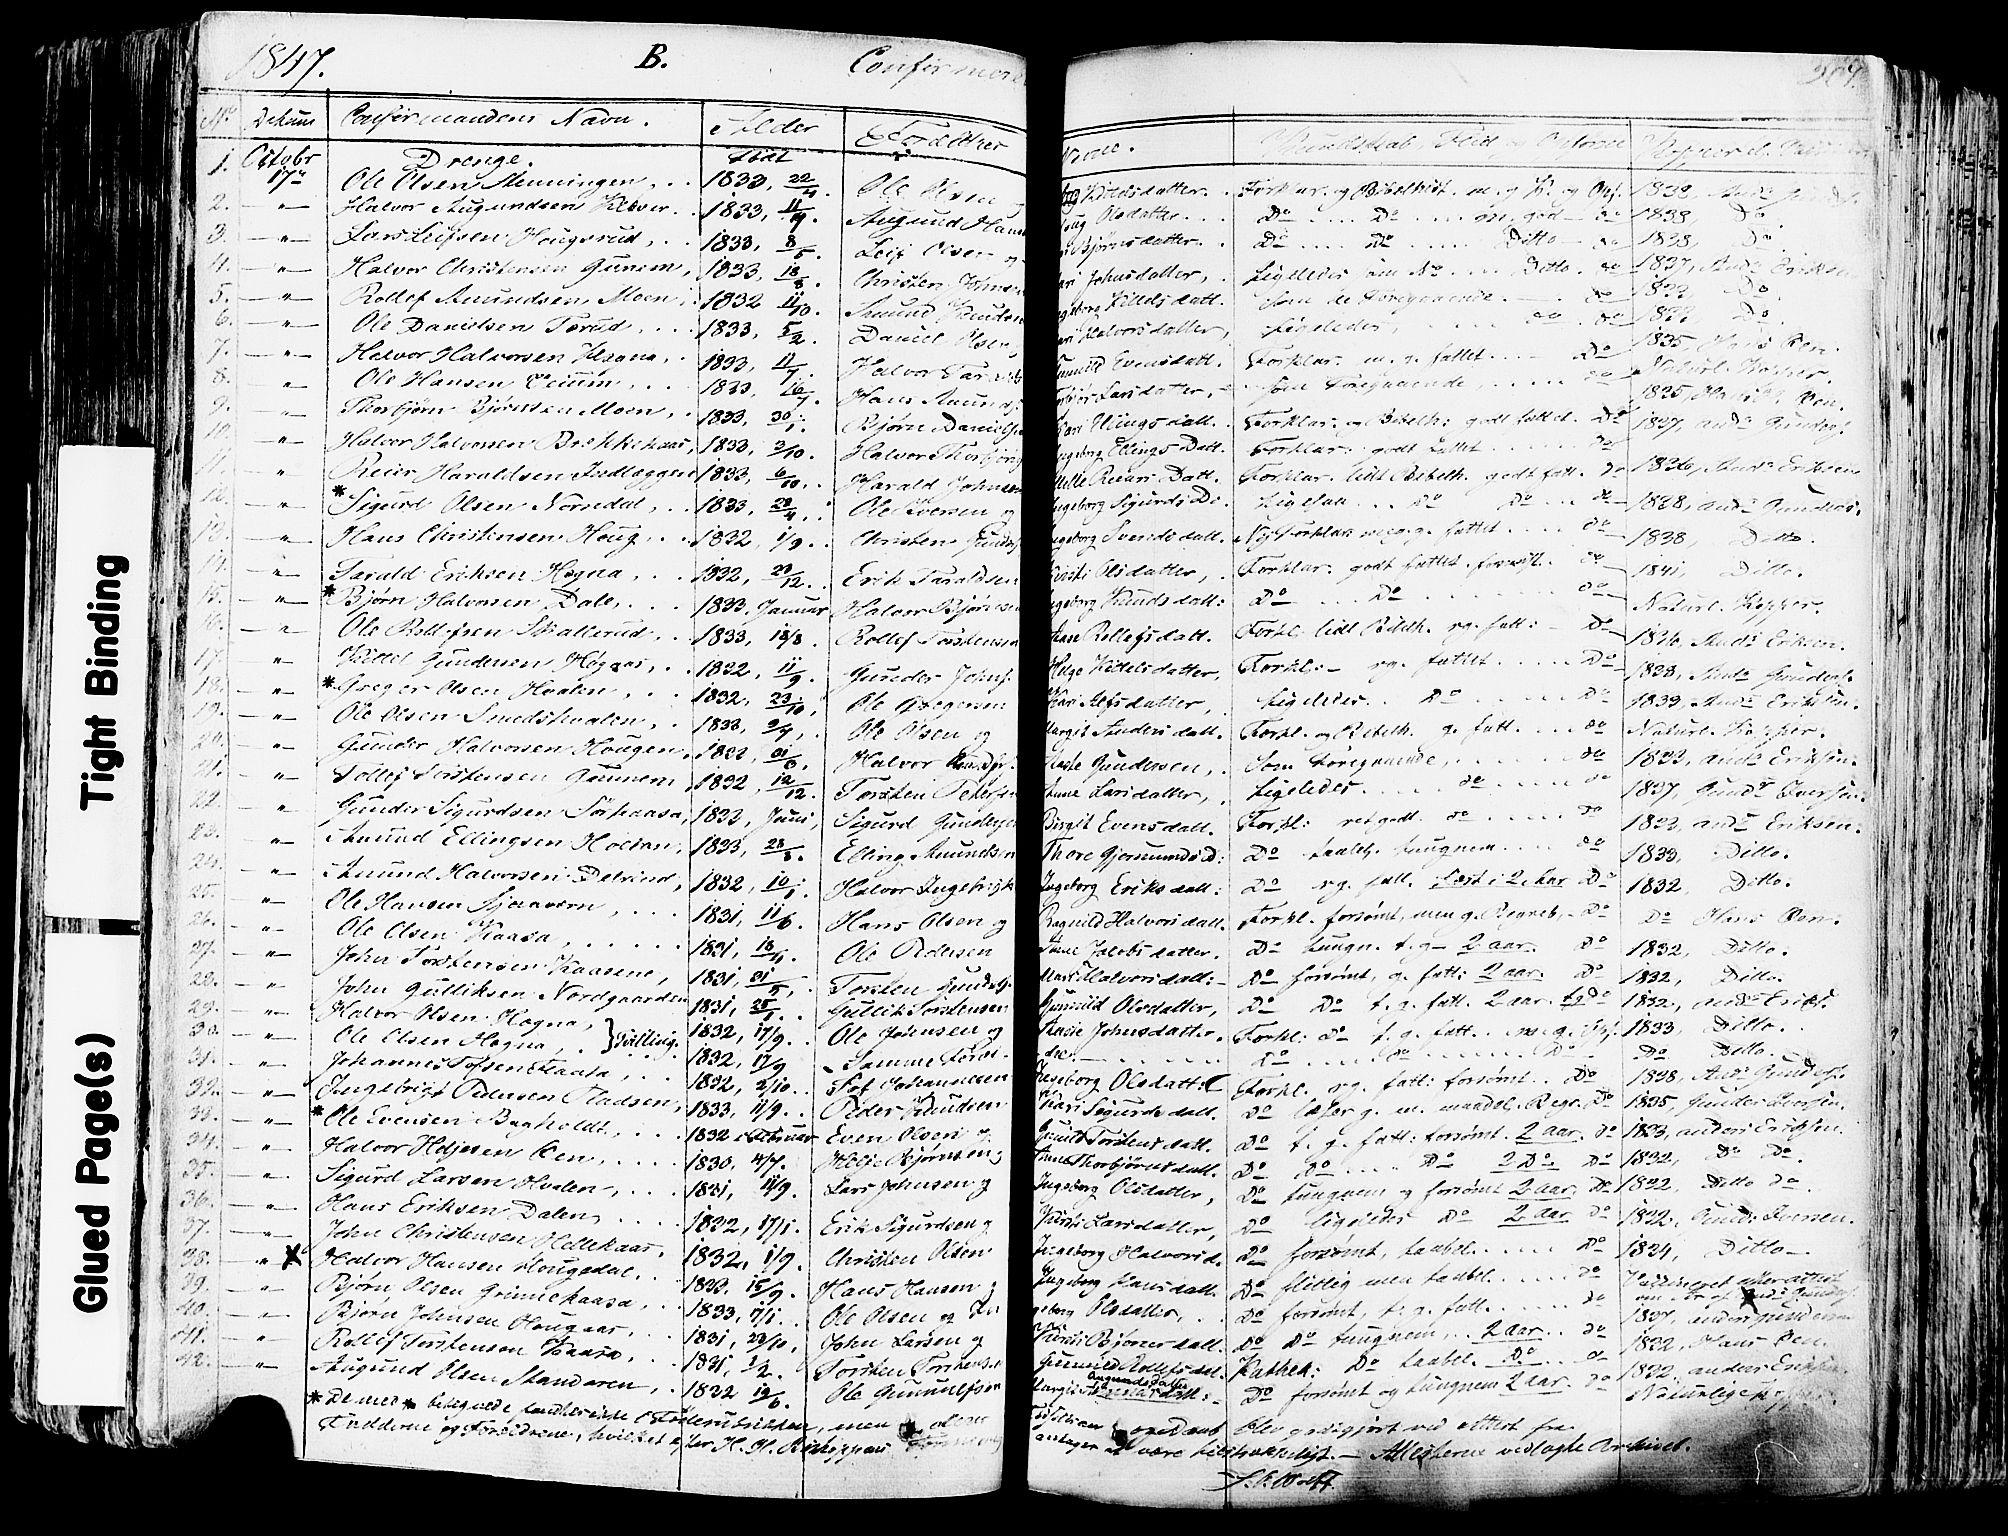 SAKO, Sauherad kirkebøker, F/Fa/L0006: Ministerialbok nr. I 6, 1827-1850, s. 207